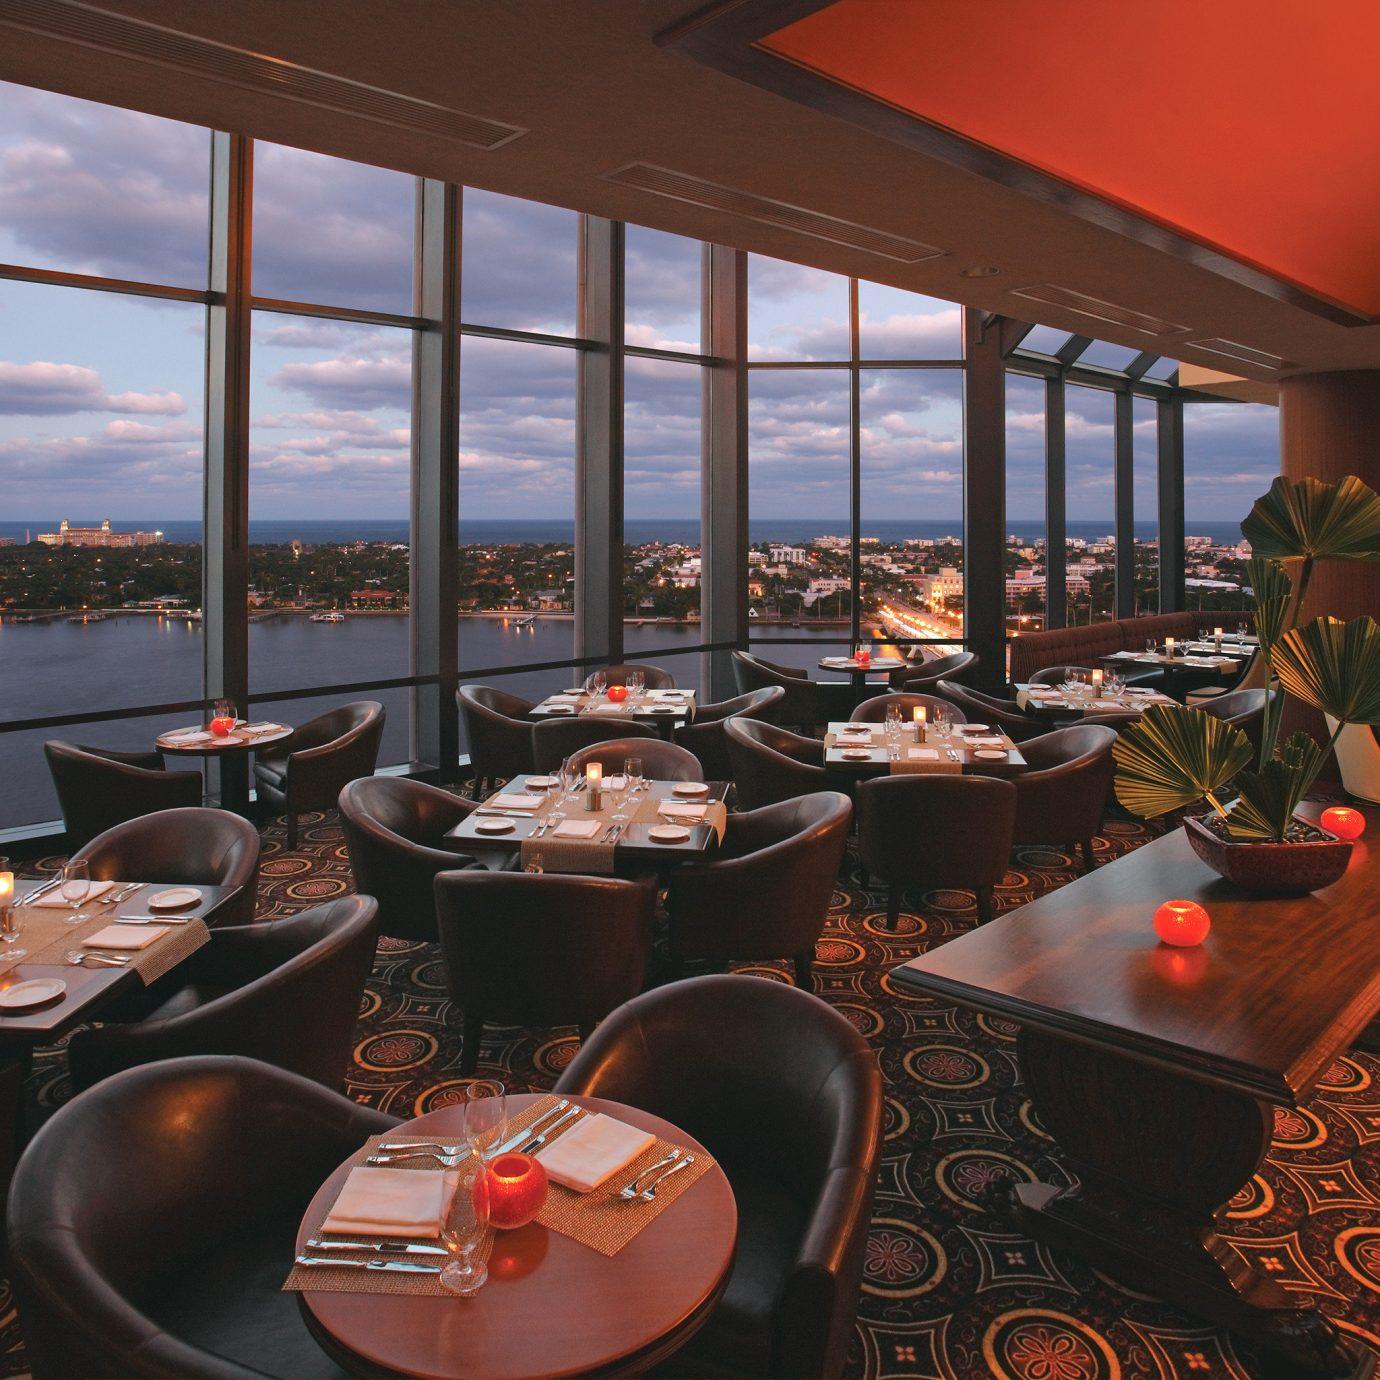 Bar Dining Drink Eat Luxury chair restaurant Resort overlooking set